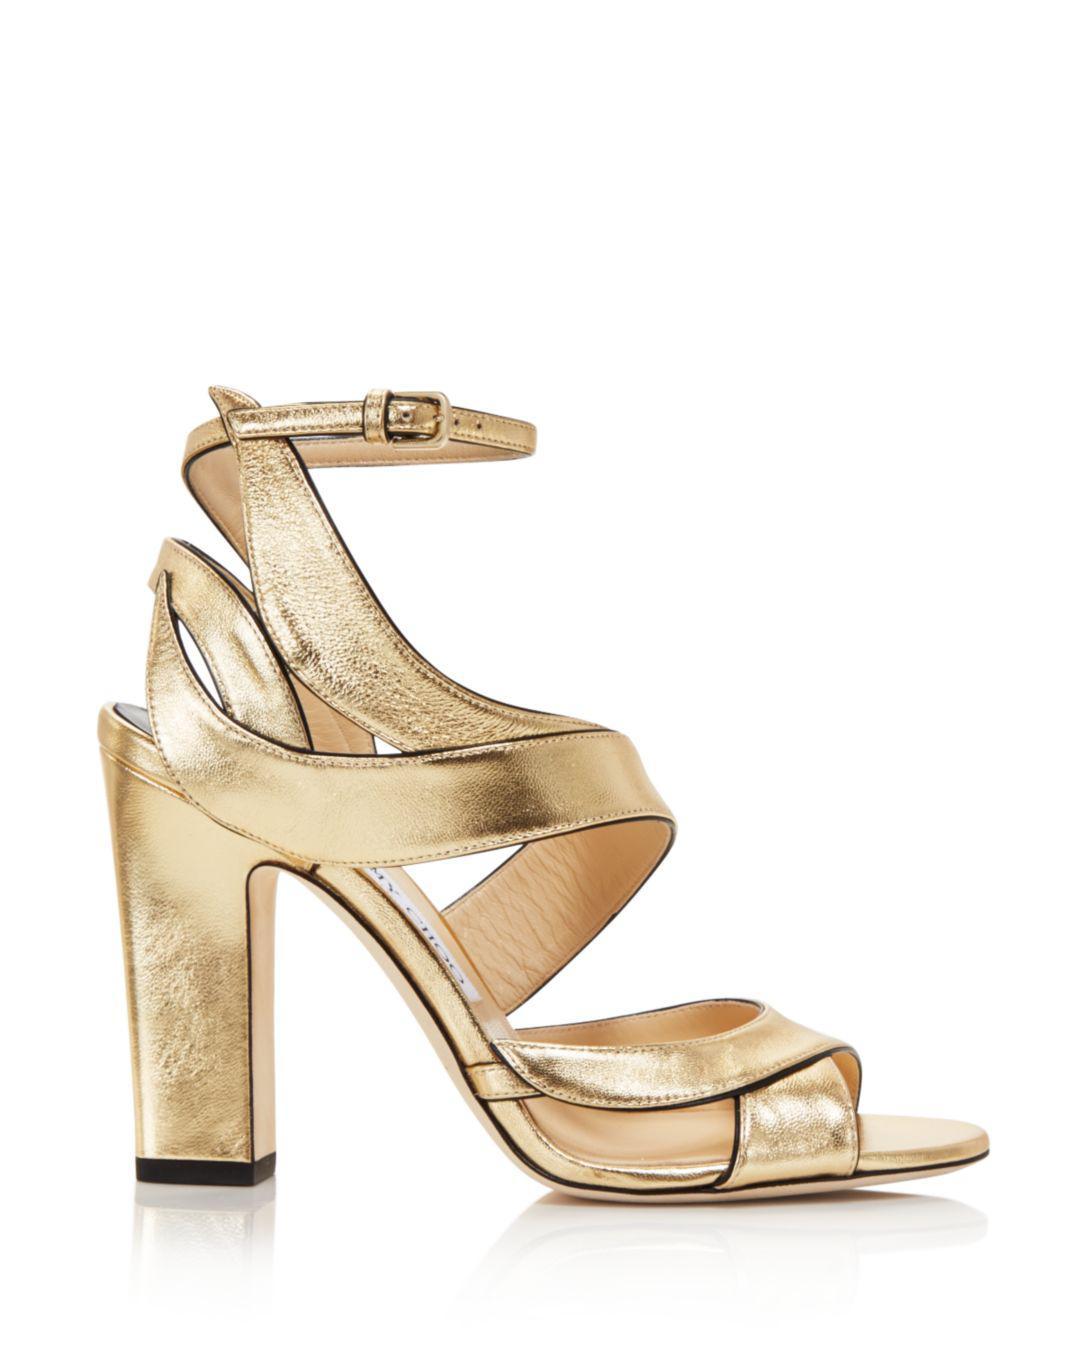 9da3a06e892 Lyst - Jimmy Choo Women s Falcon 100 Leather High-heel Sandals in ...